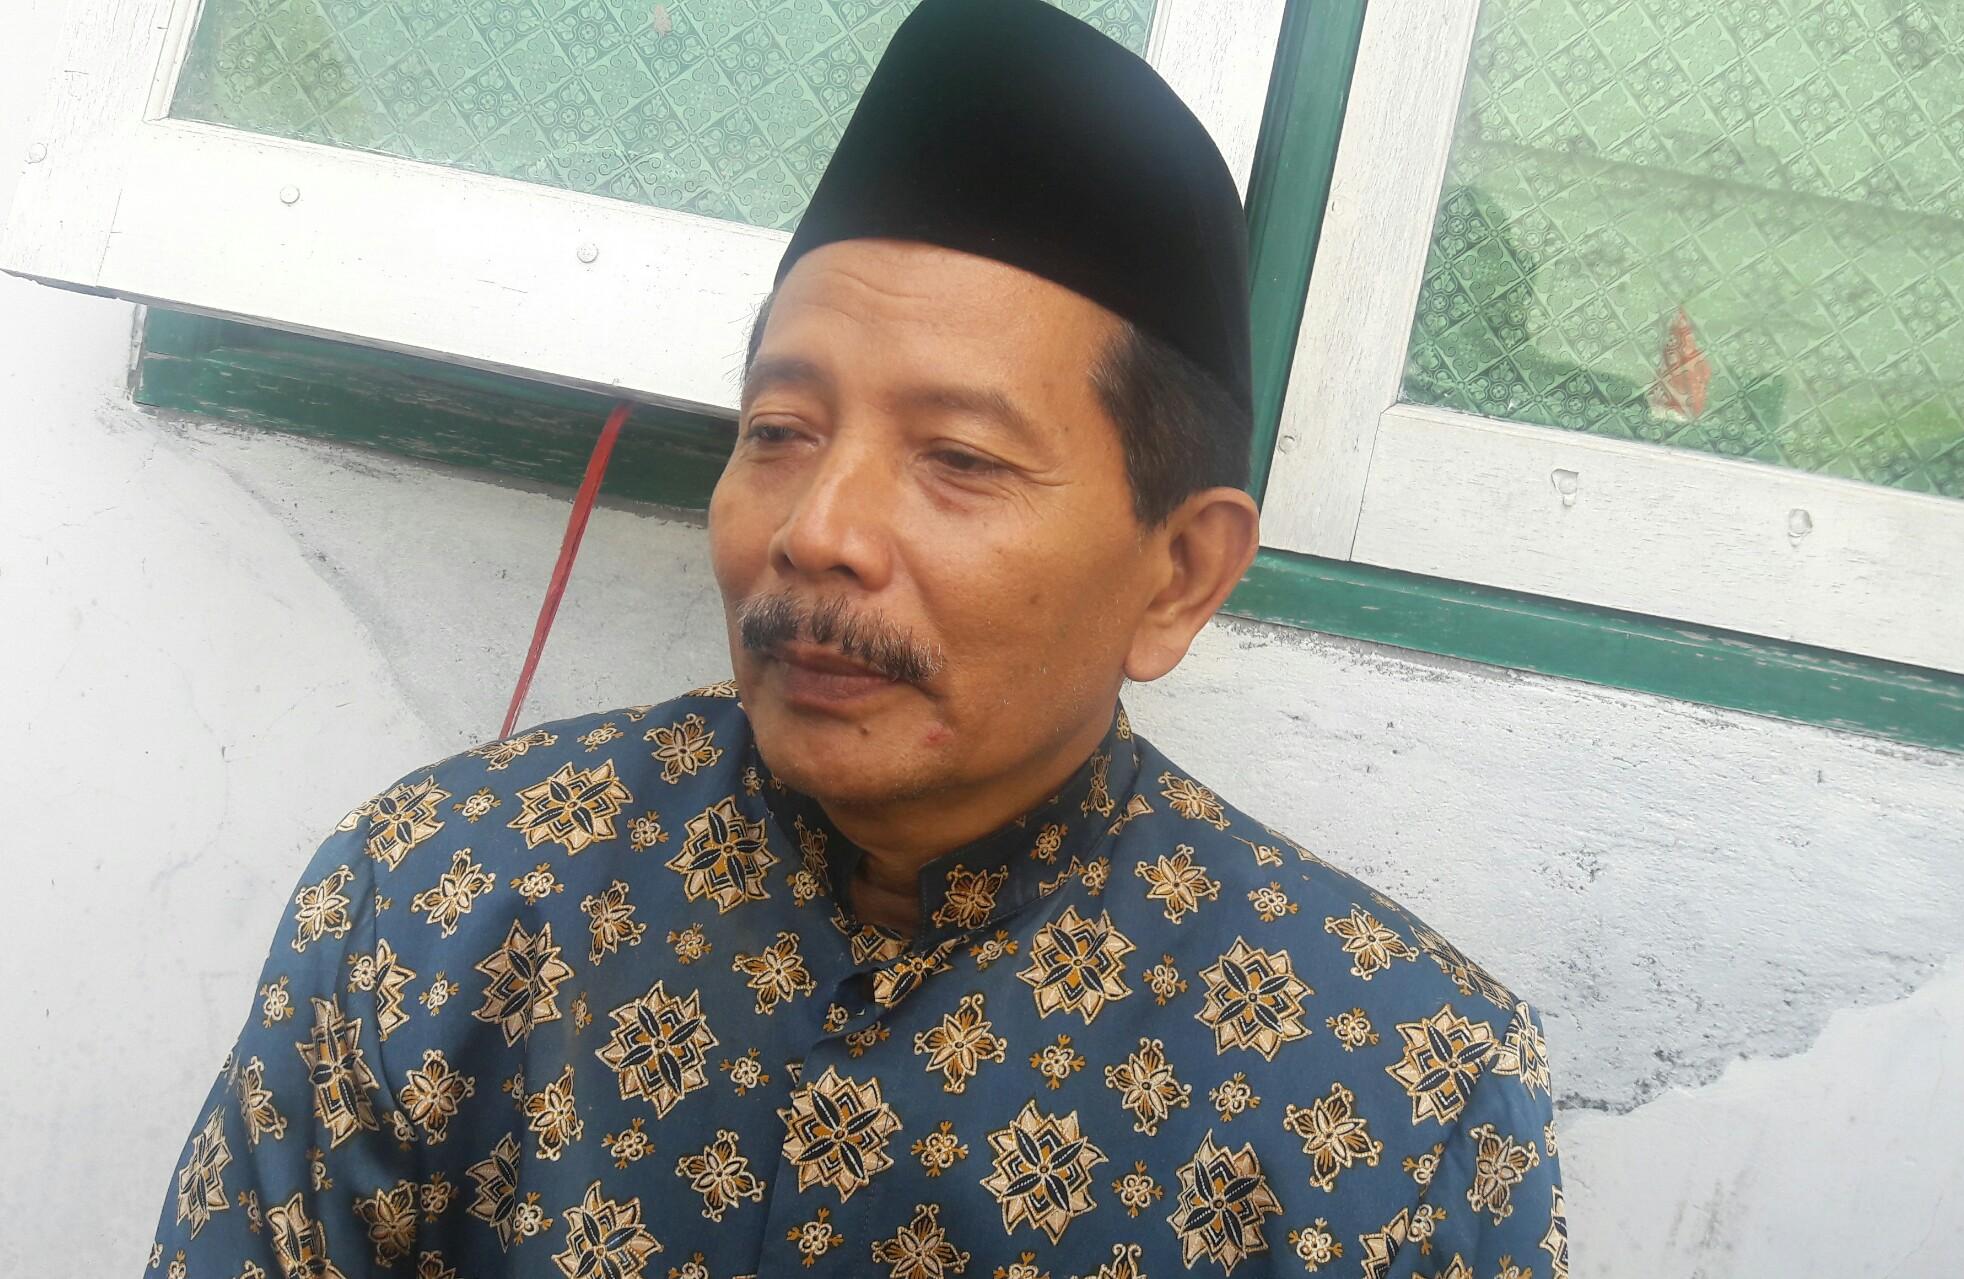 anggota DPRD Jatim Makin Abbas saat ditemui di Surabaya, Jumat (6/12/2019).